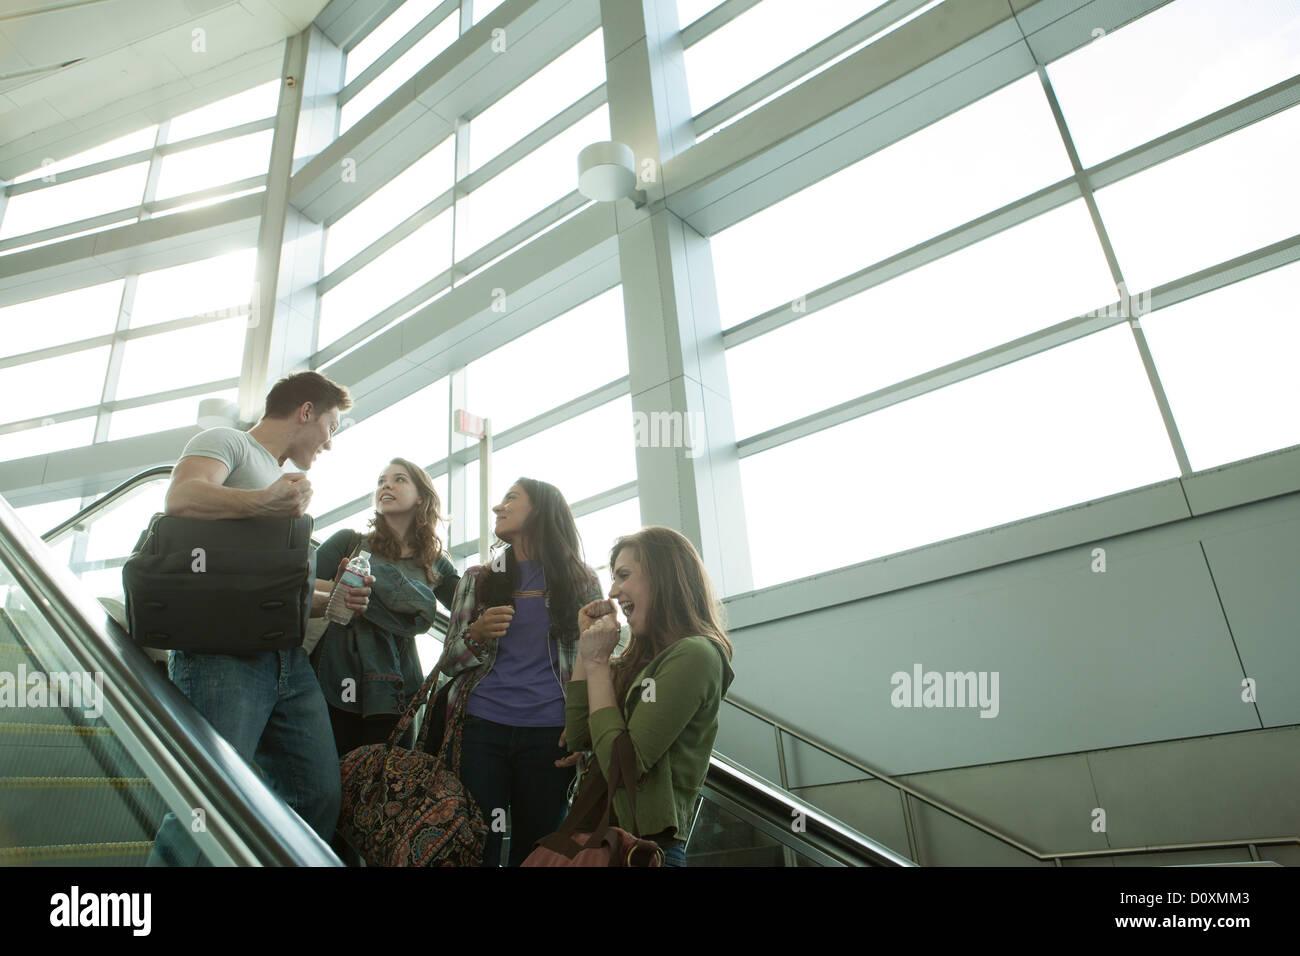 Friends travelling on escalator - Stock Image